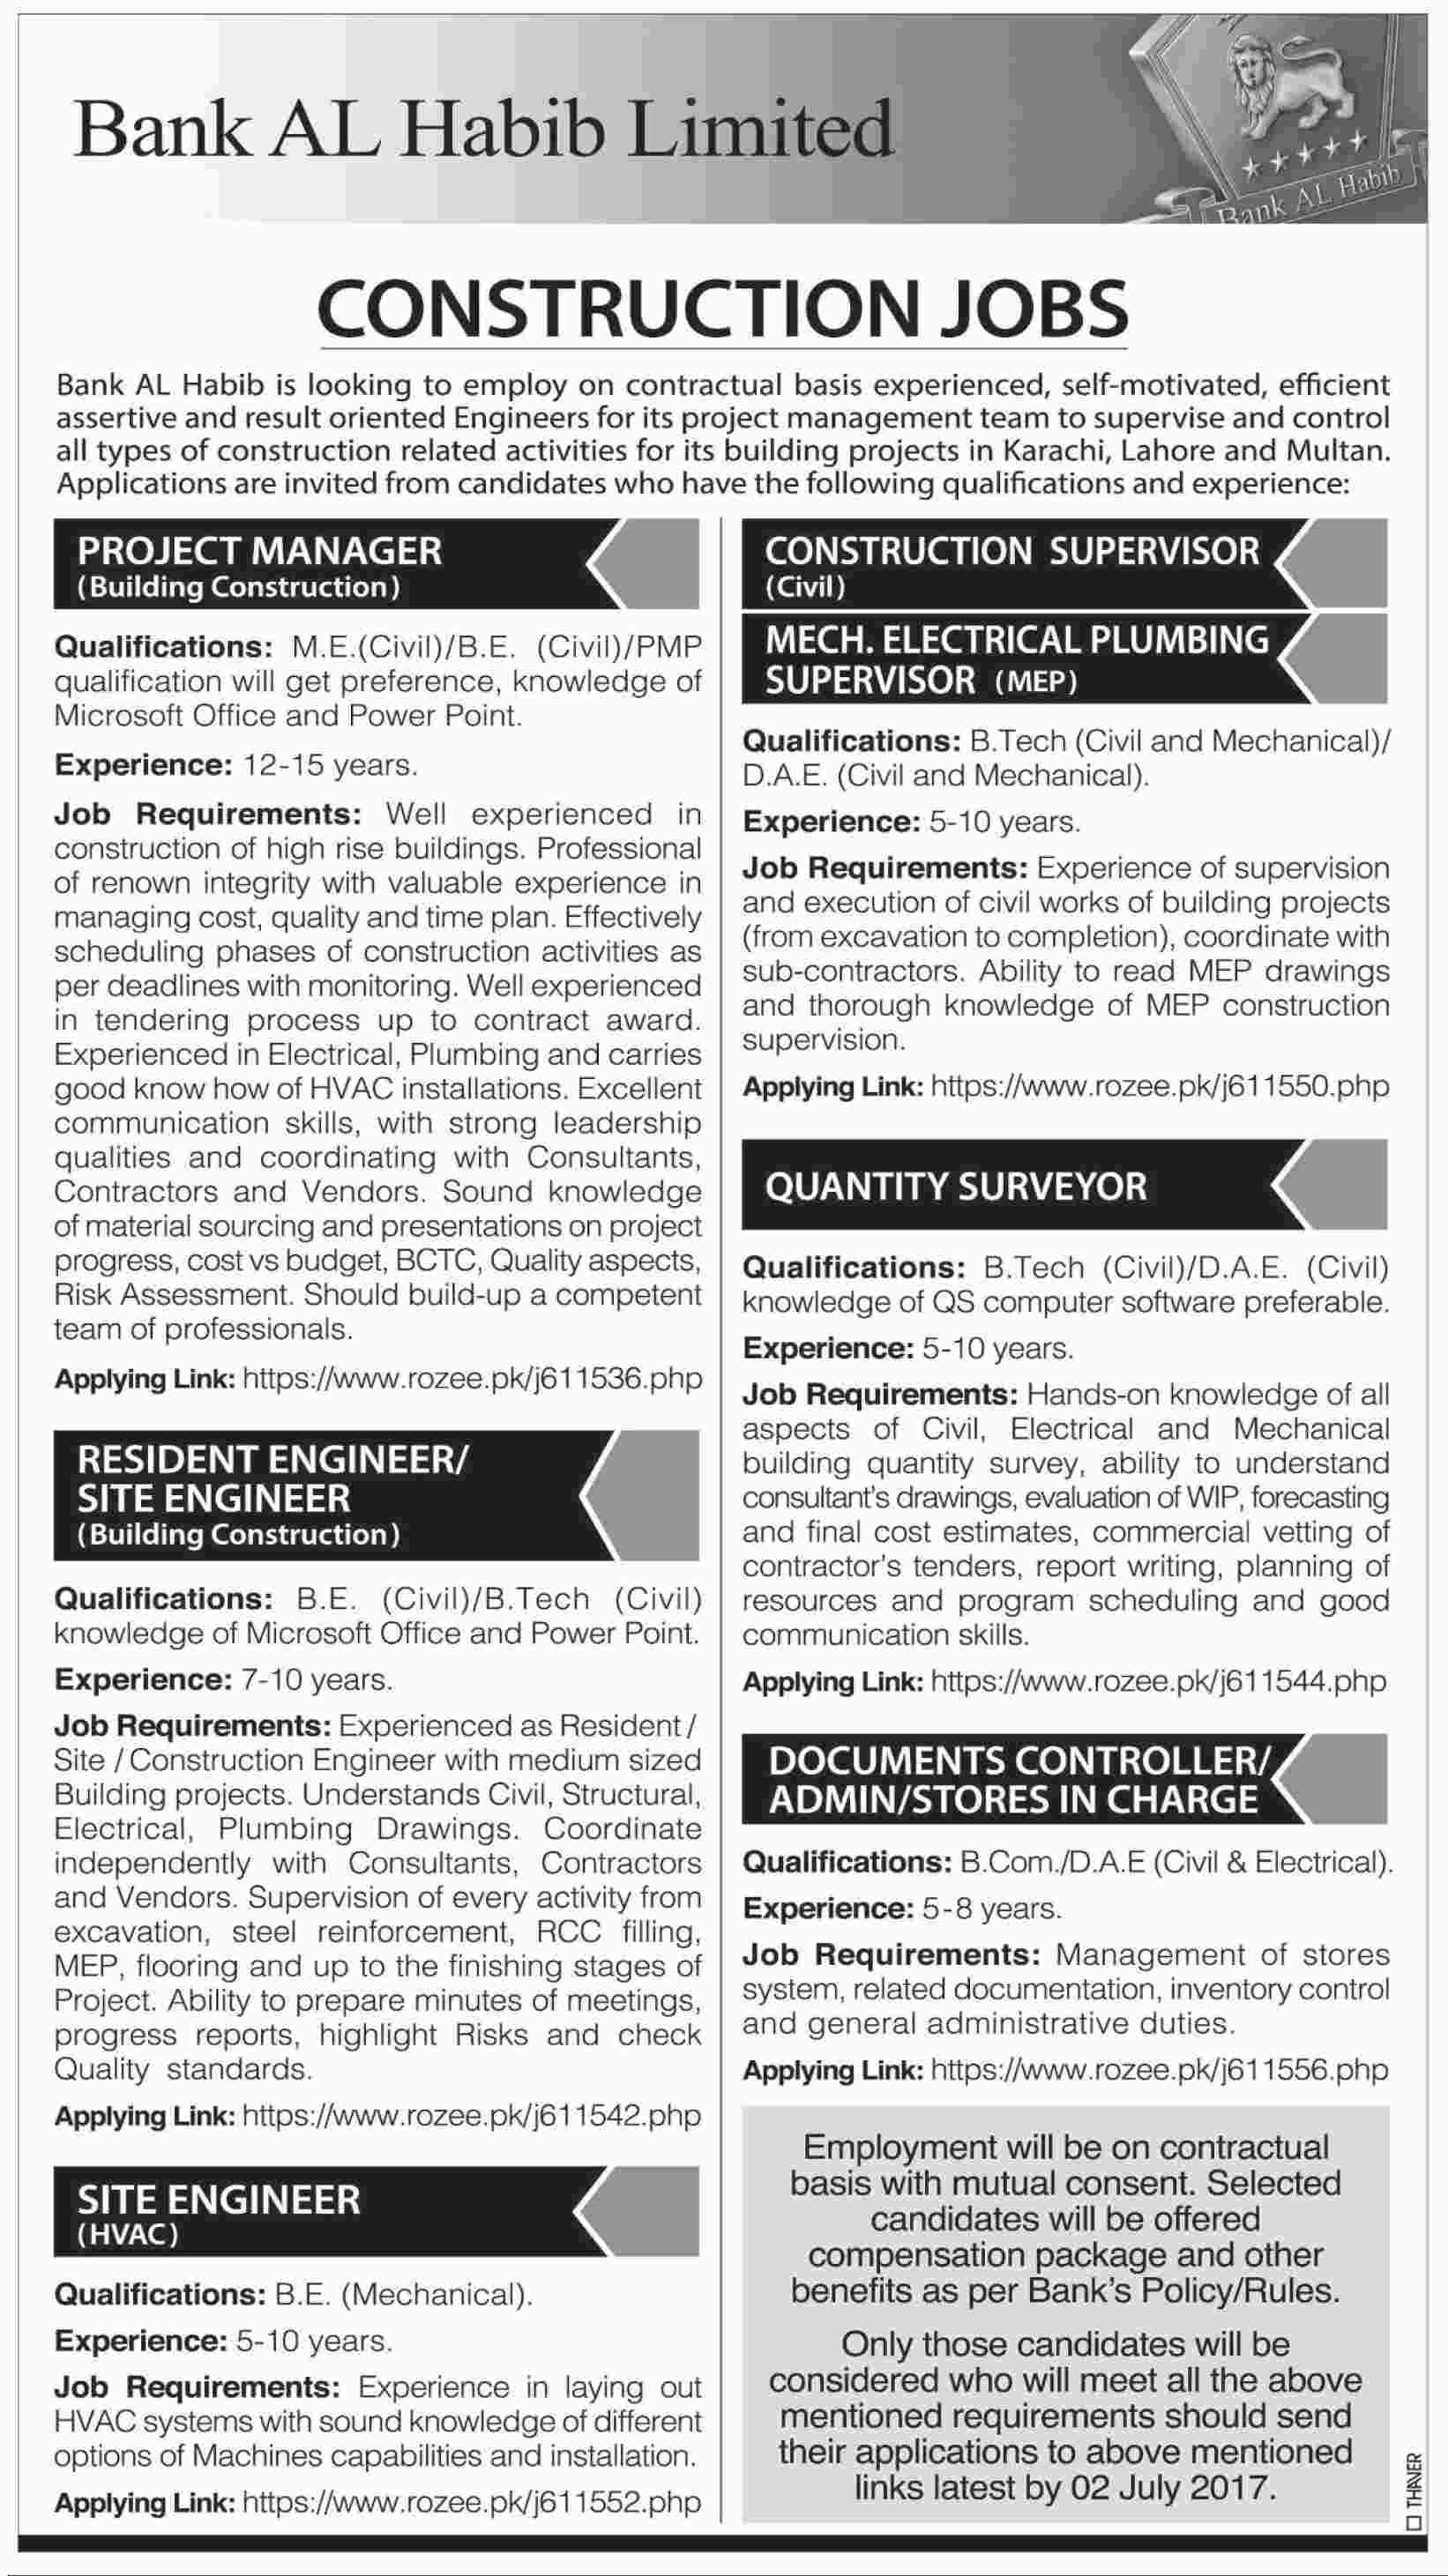 Bank AL Habib Limited Jobs 2017 Latest Apply Online